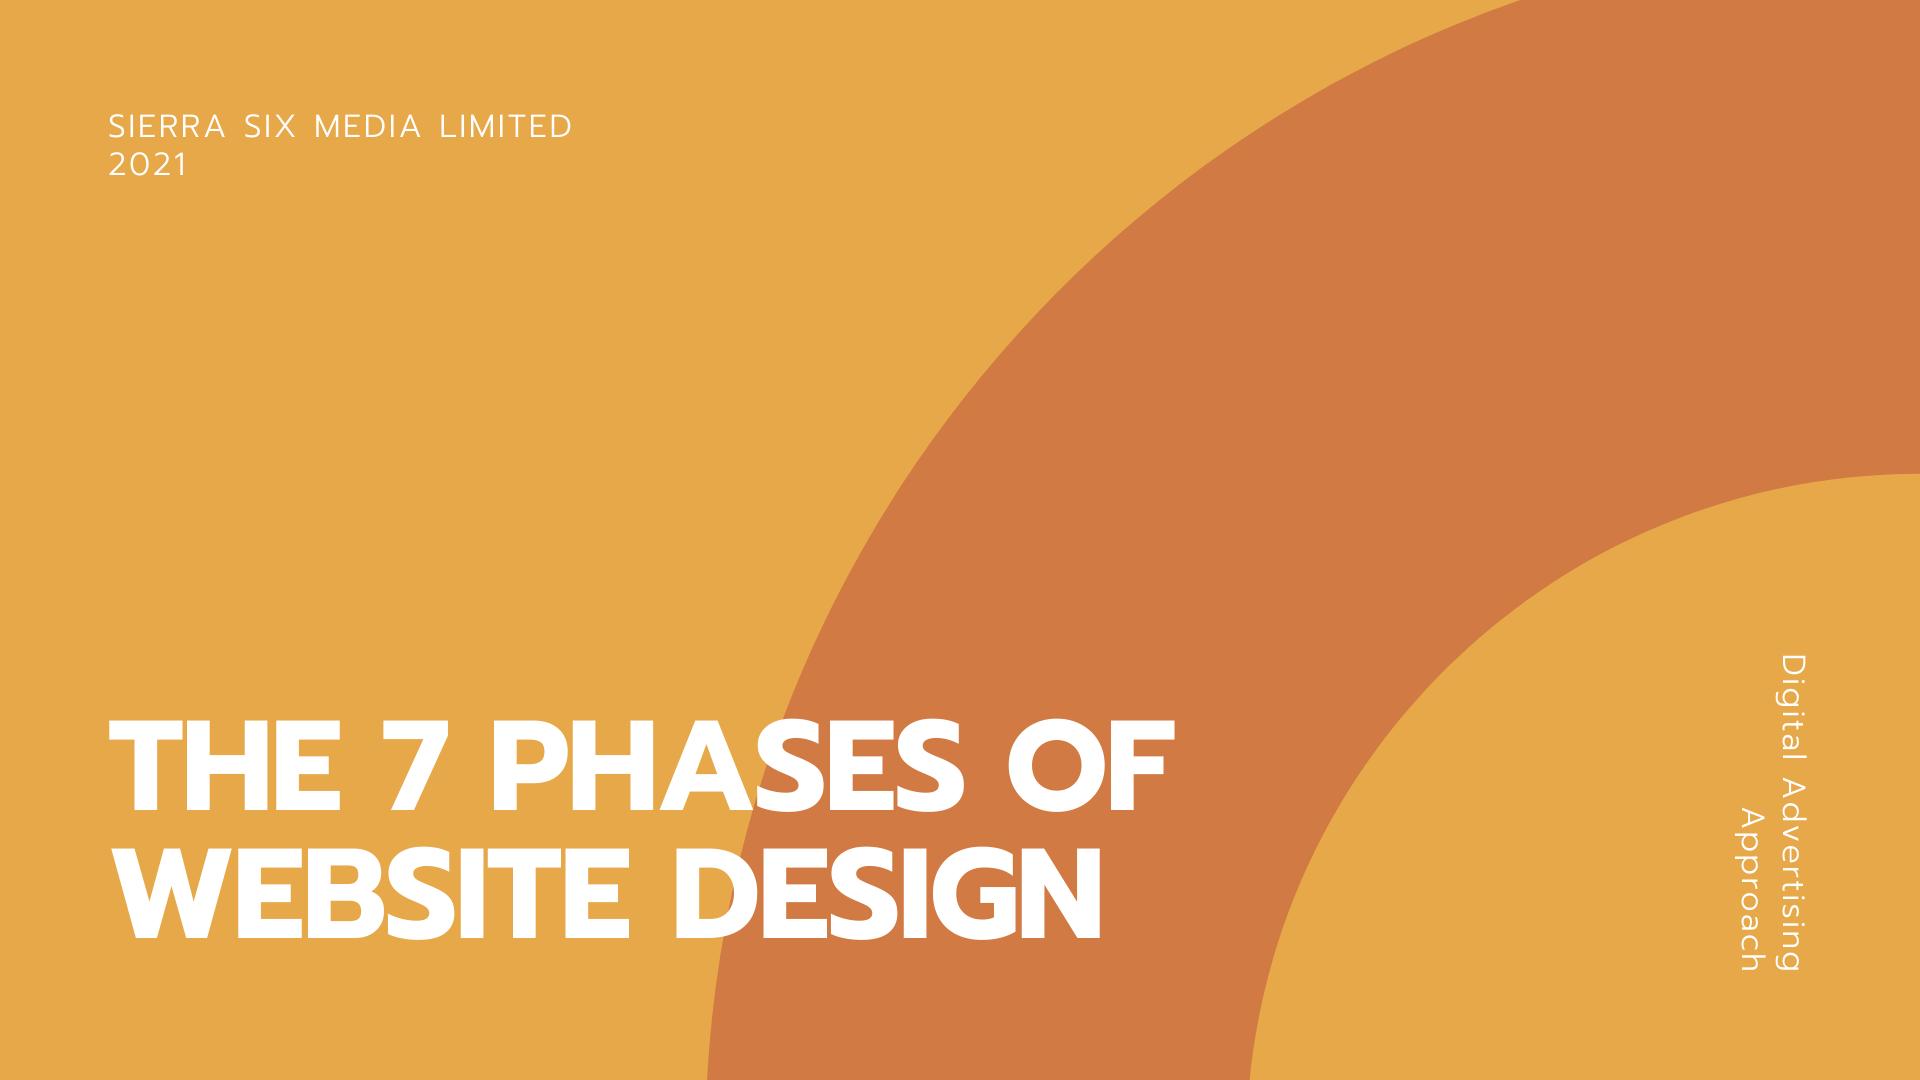 Sierra Six Media, Digital marketing agency whitepaper: phases of website redesign